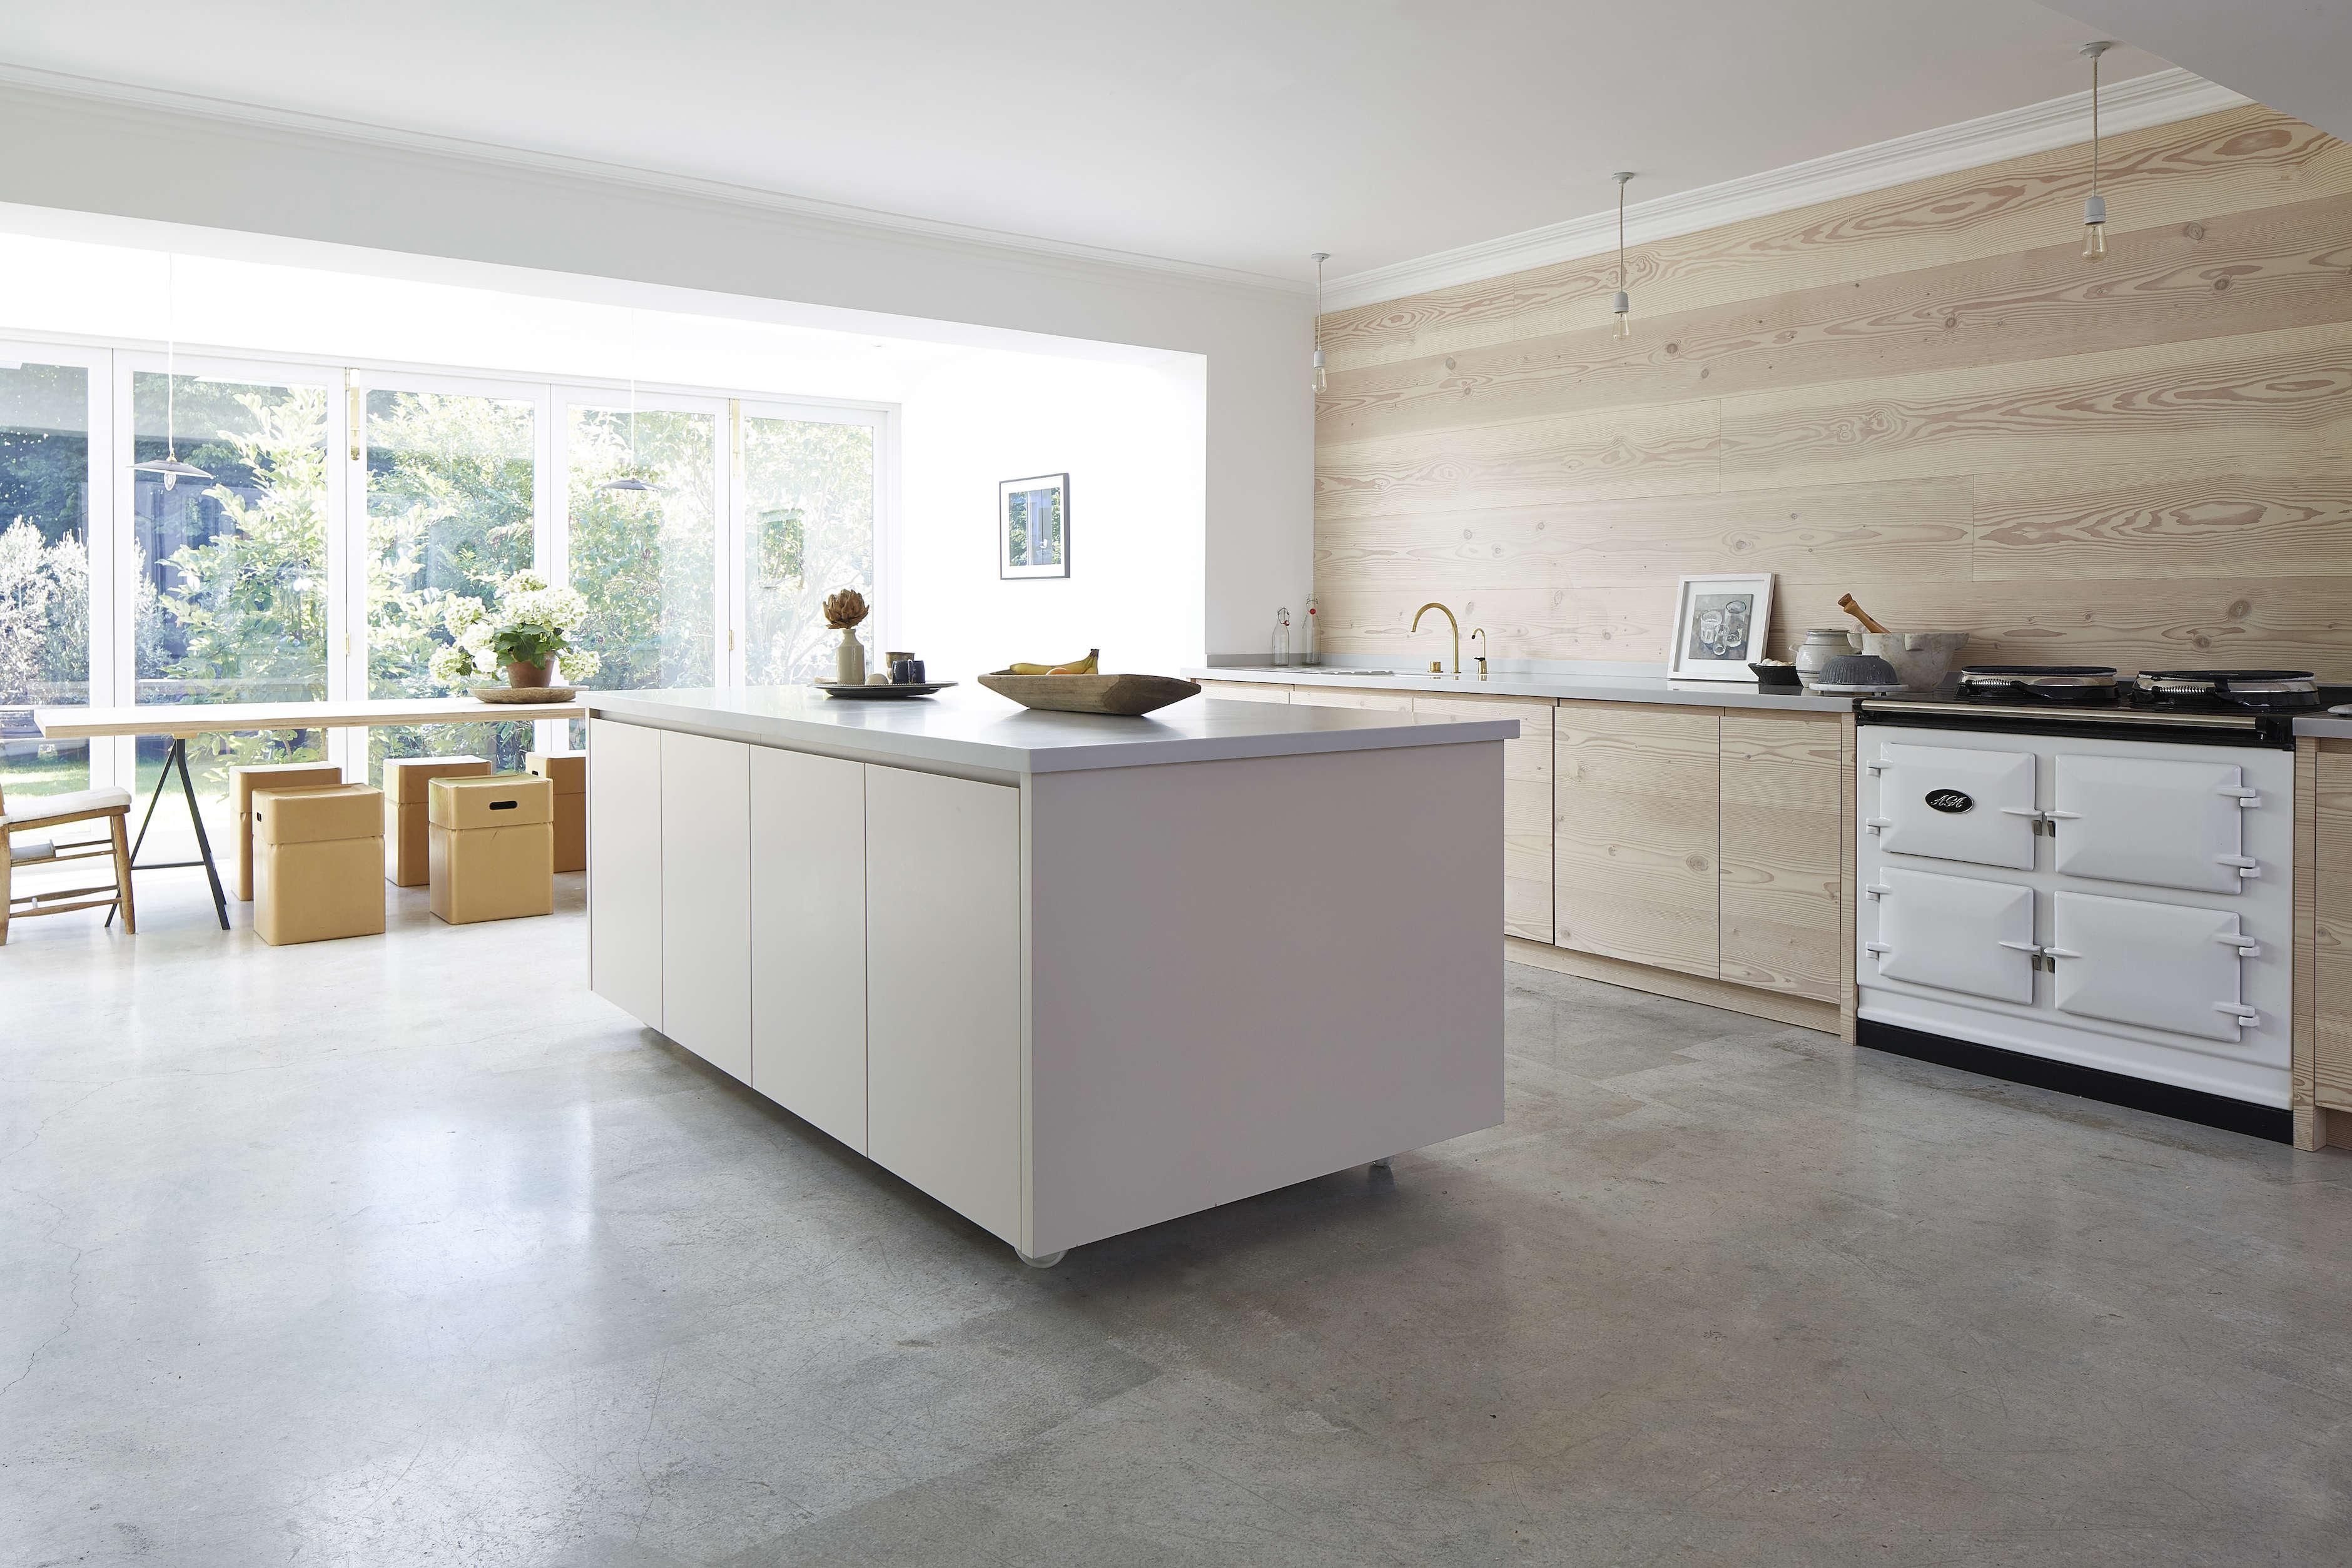 white minimalist kitchen island and window wall addition in a scandinavian pale 9